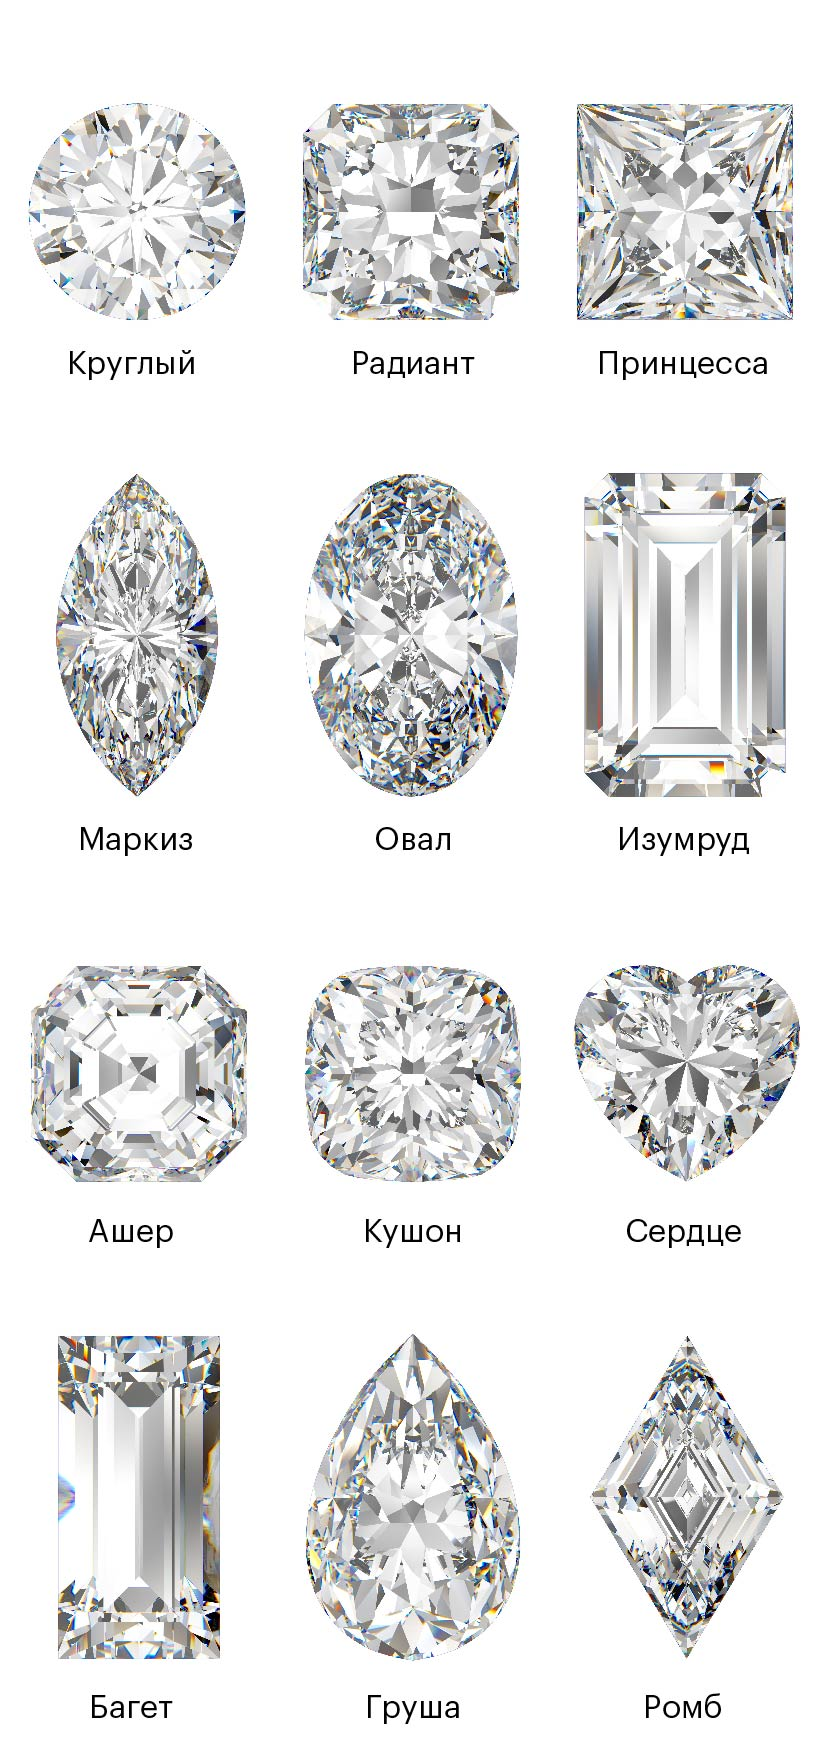 Варианты огранки алмазов. Источник: Shutterstock